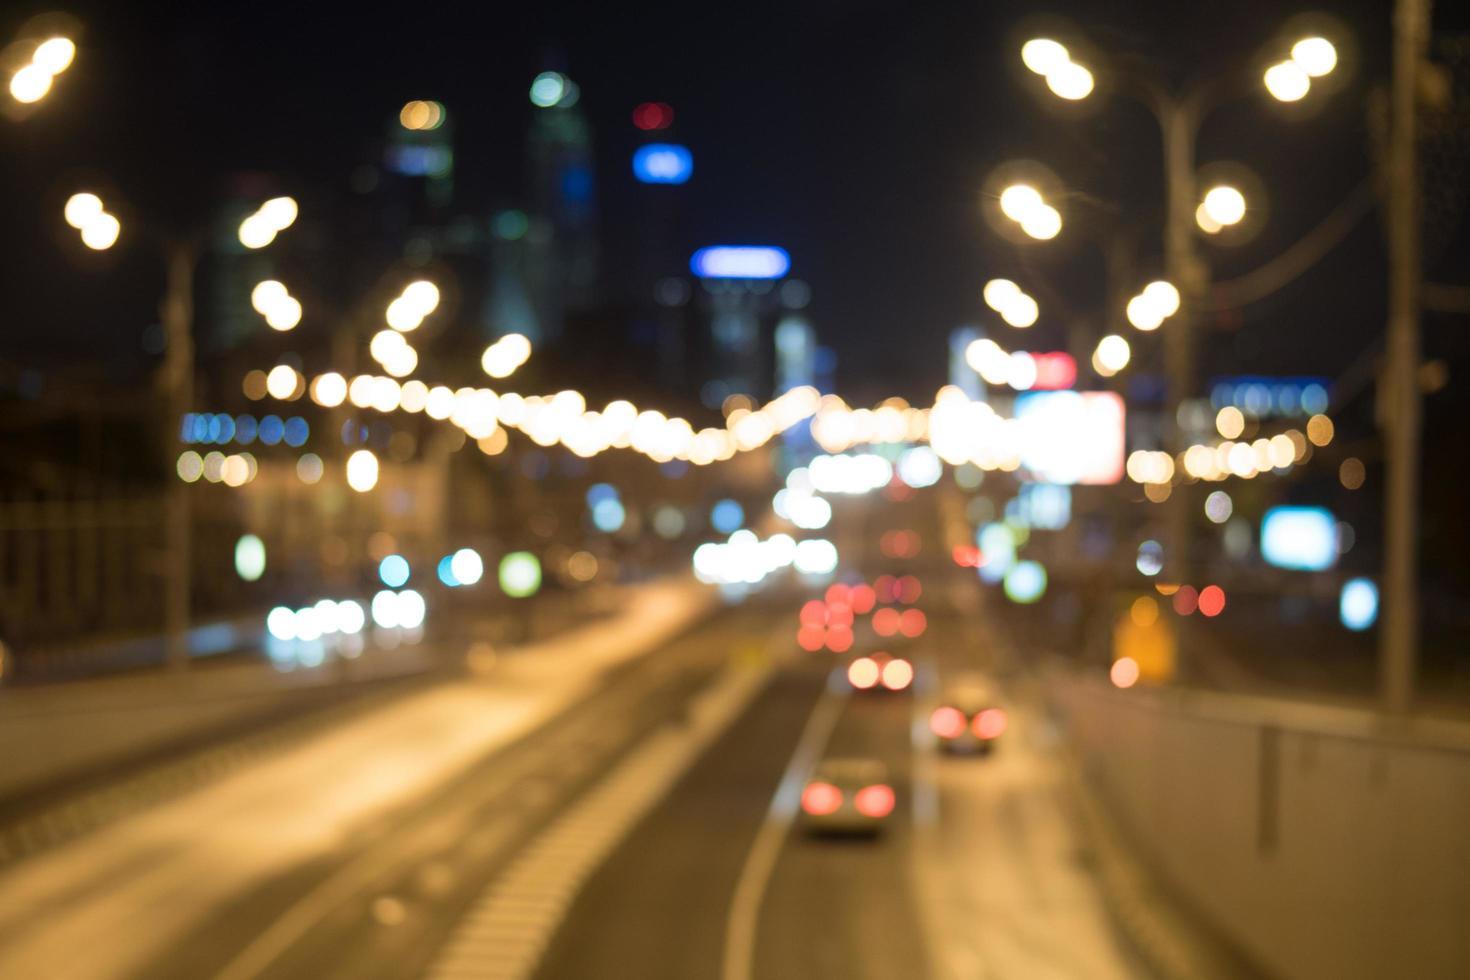 Blurred cityscape at night photo